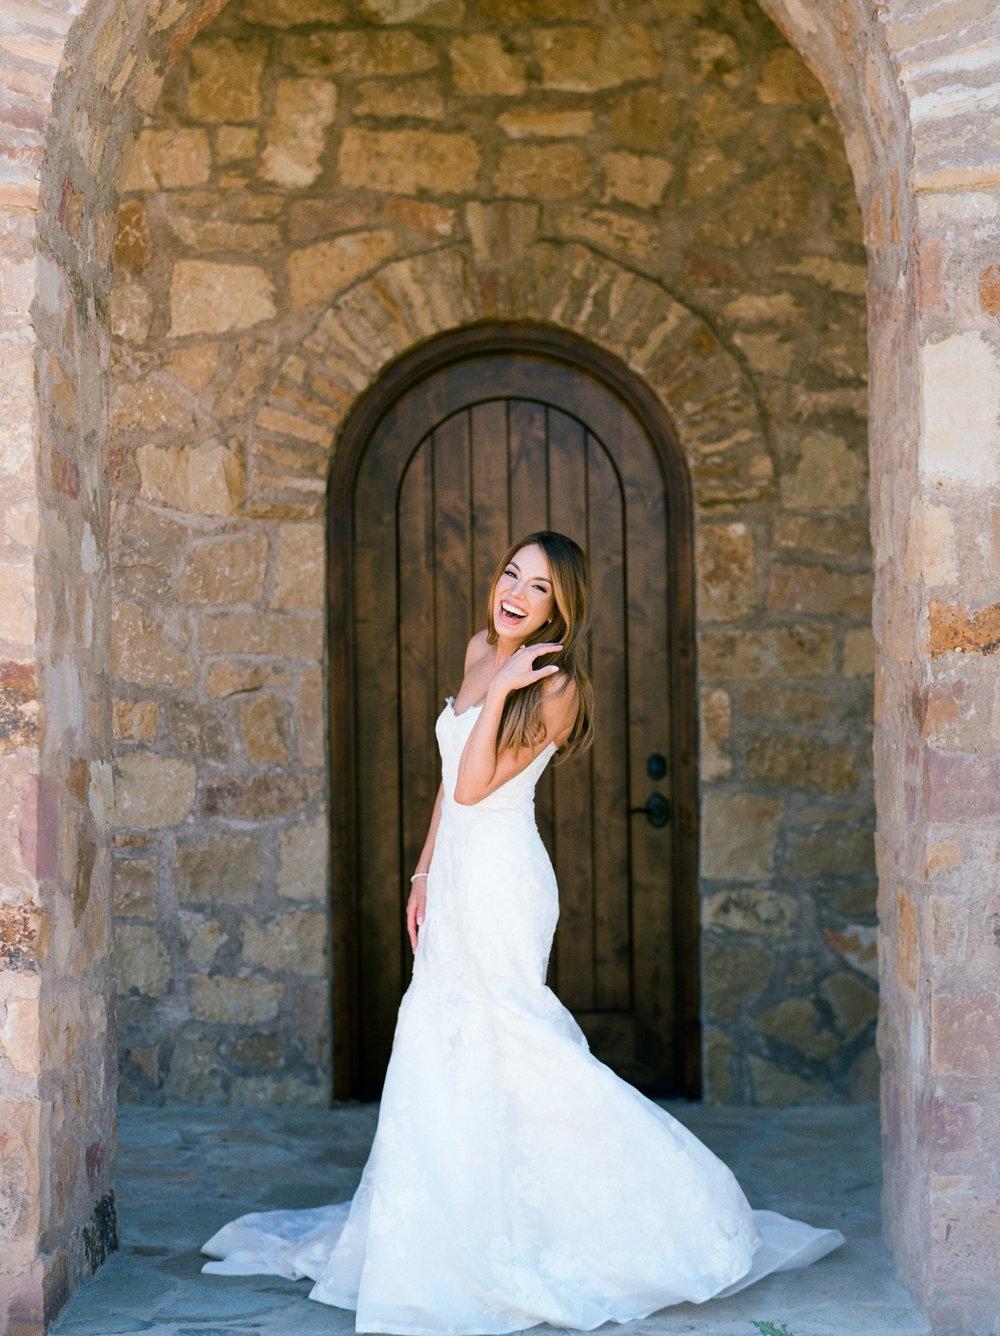 Escondido-Golf_Lake-Club-Hill-Country-Houston-Wedding-Photographer-Best-Top-Luxury-Destination-Engagements-Portrait-Austin-Photography-51.jpg